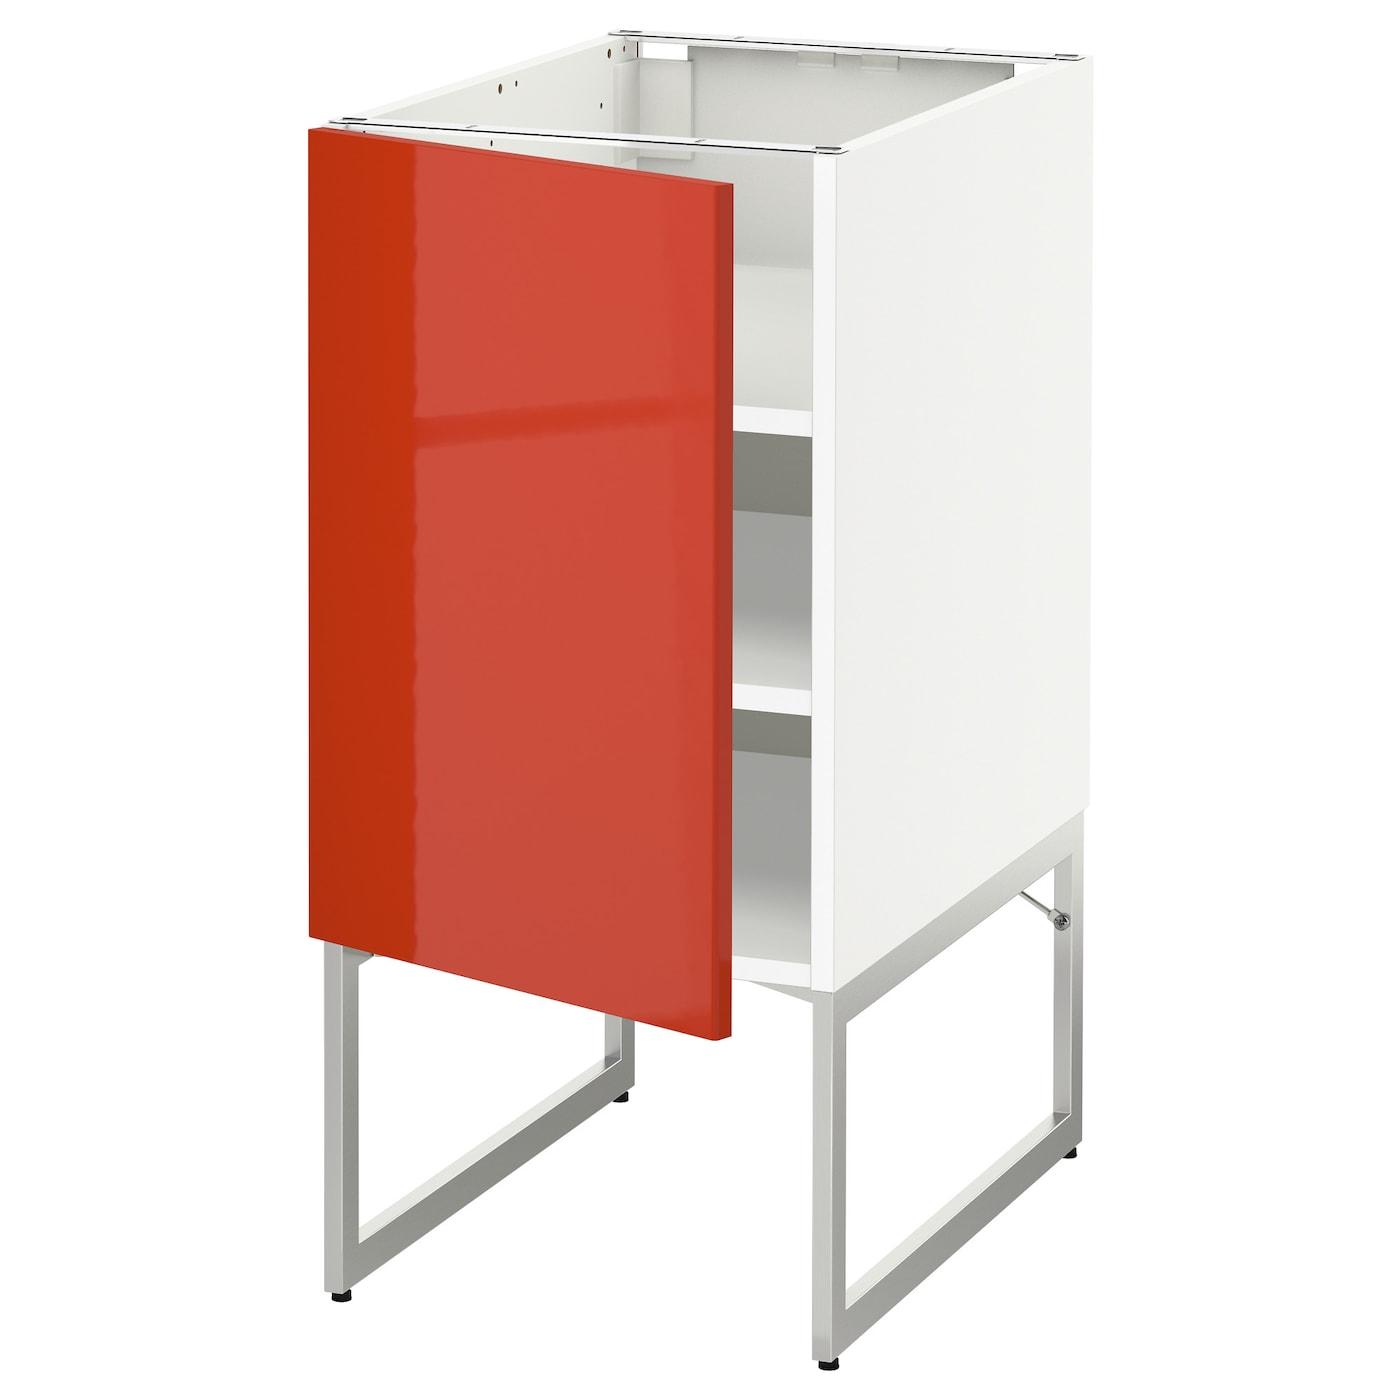 METOD Base Cabinet With Shelves White/järsta Orange